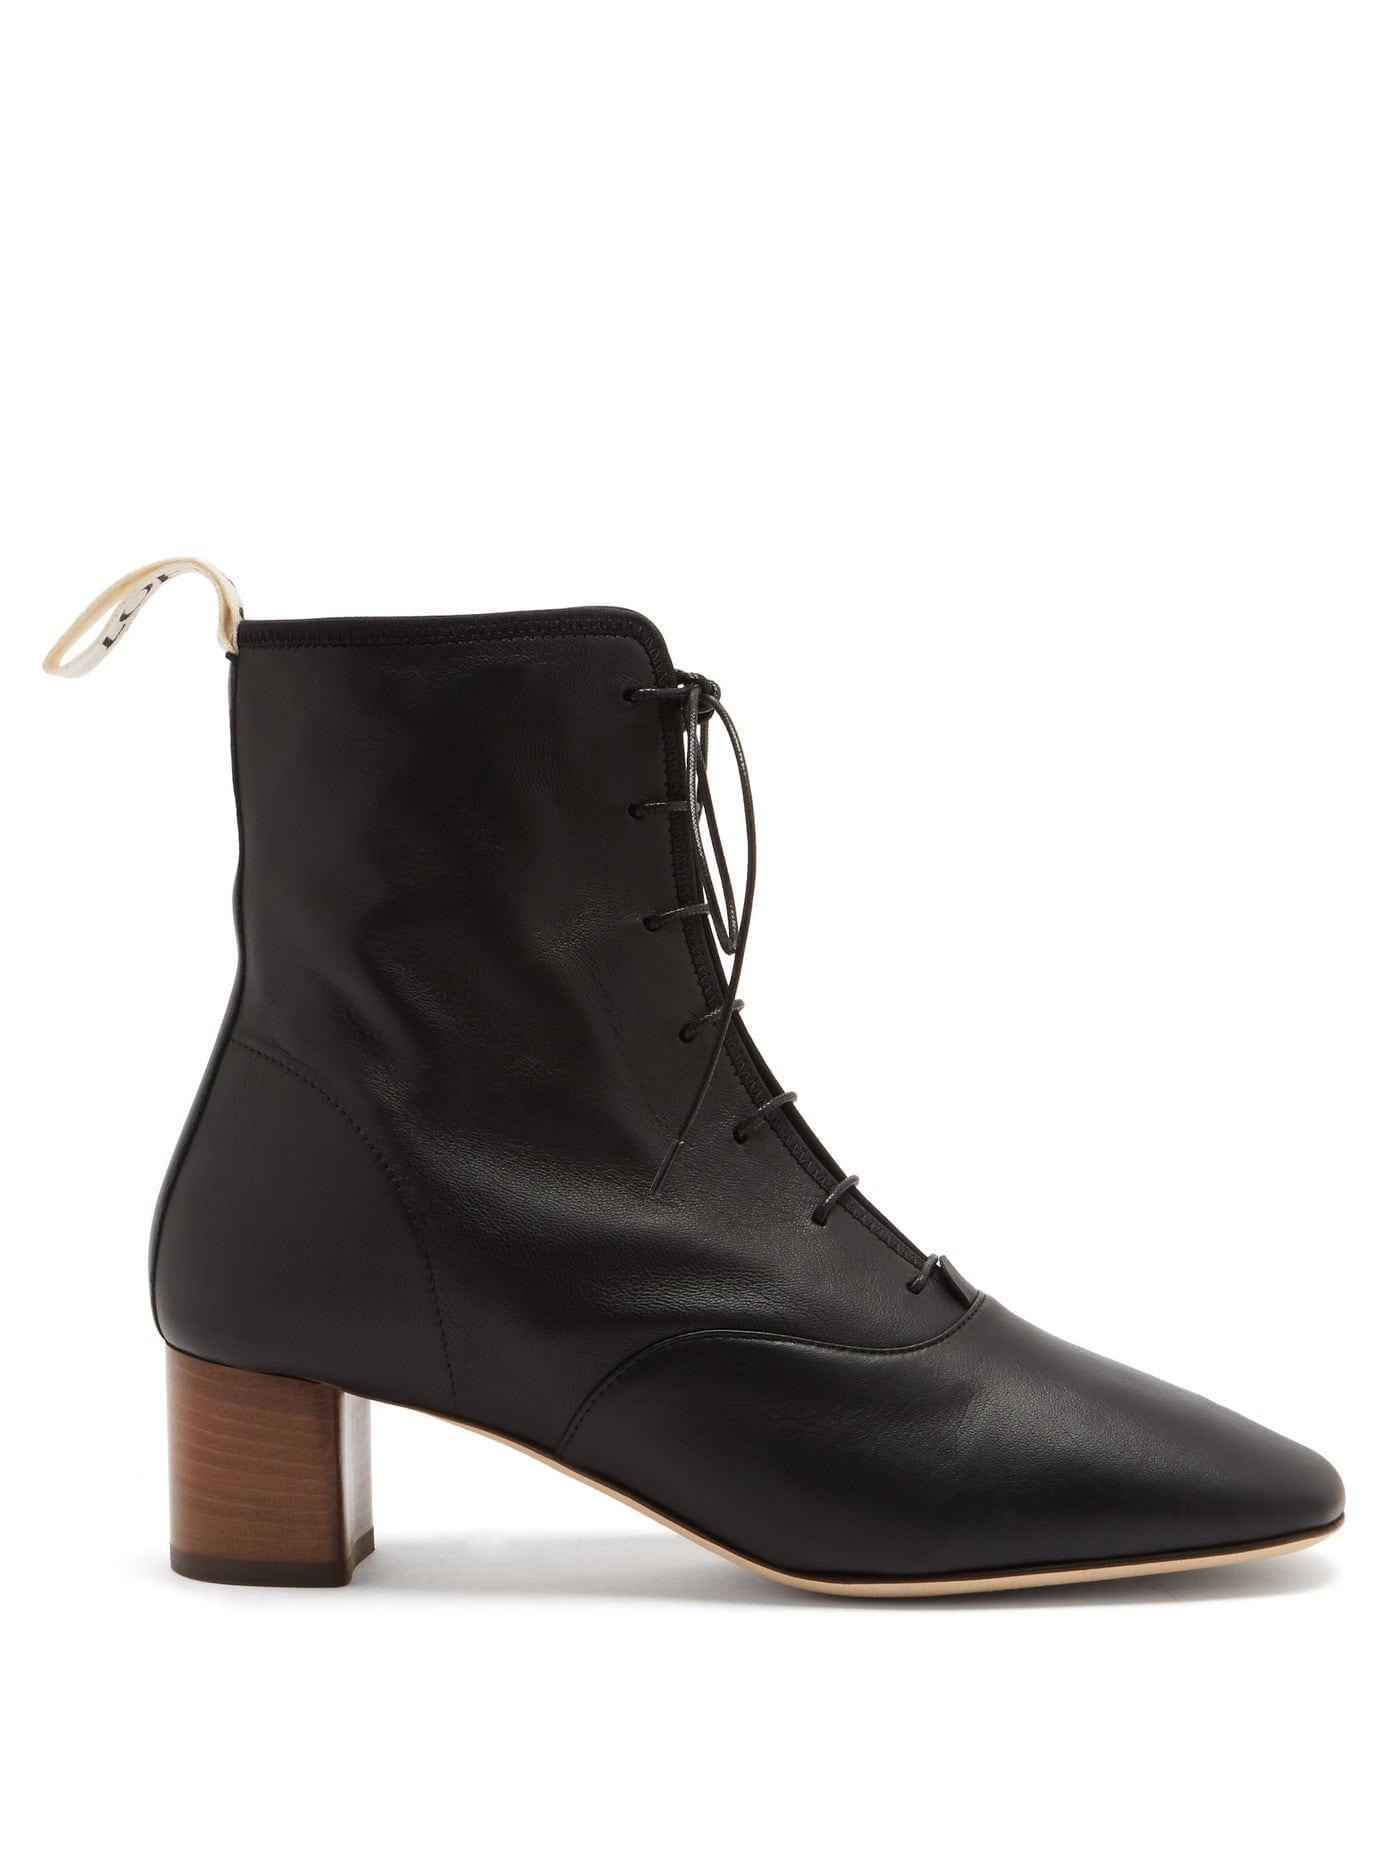 LOEWE Squared-toe Block-heel Leather Boots